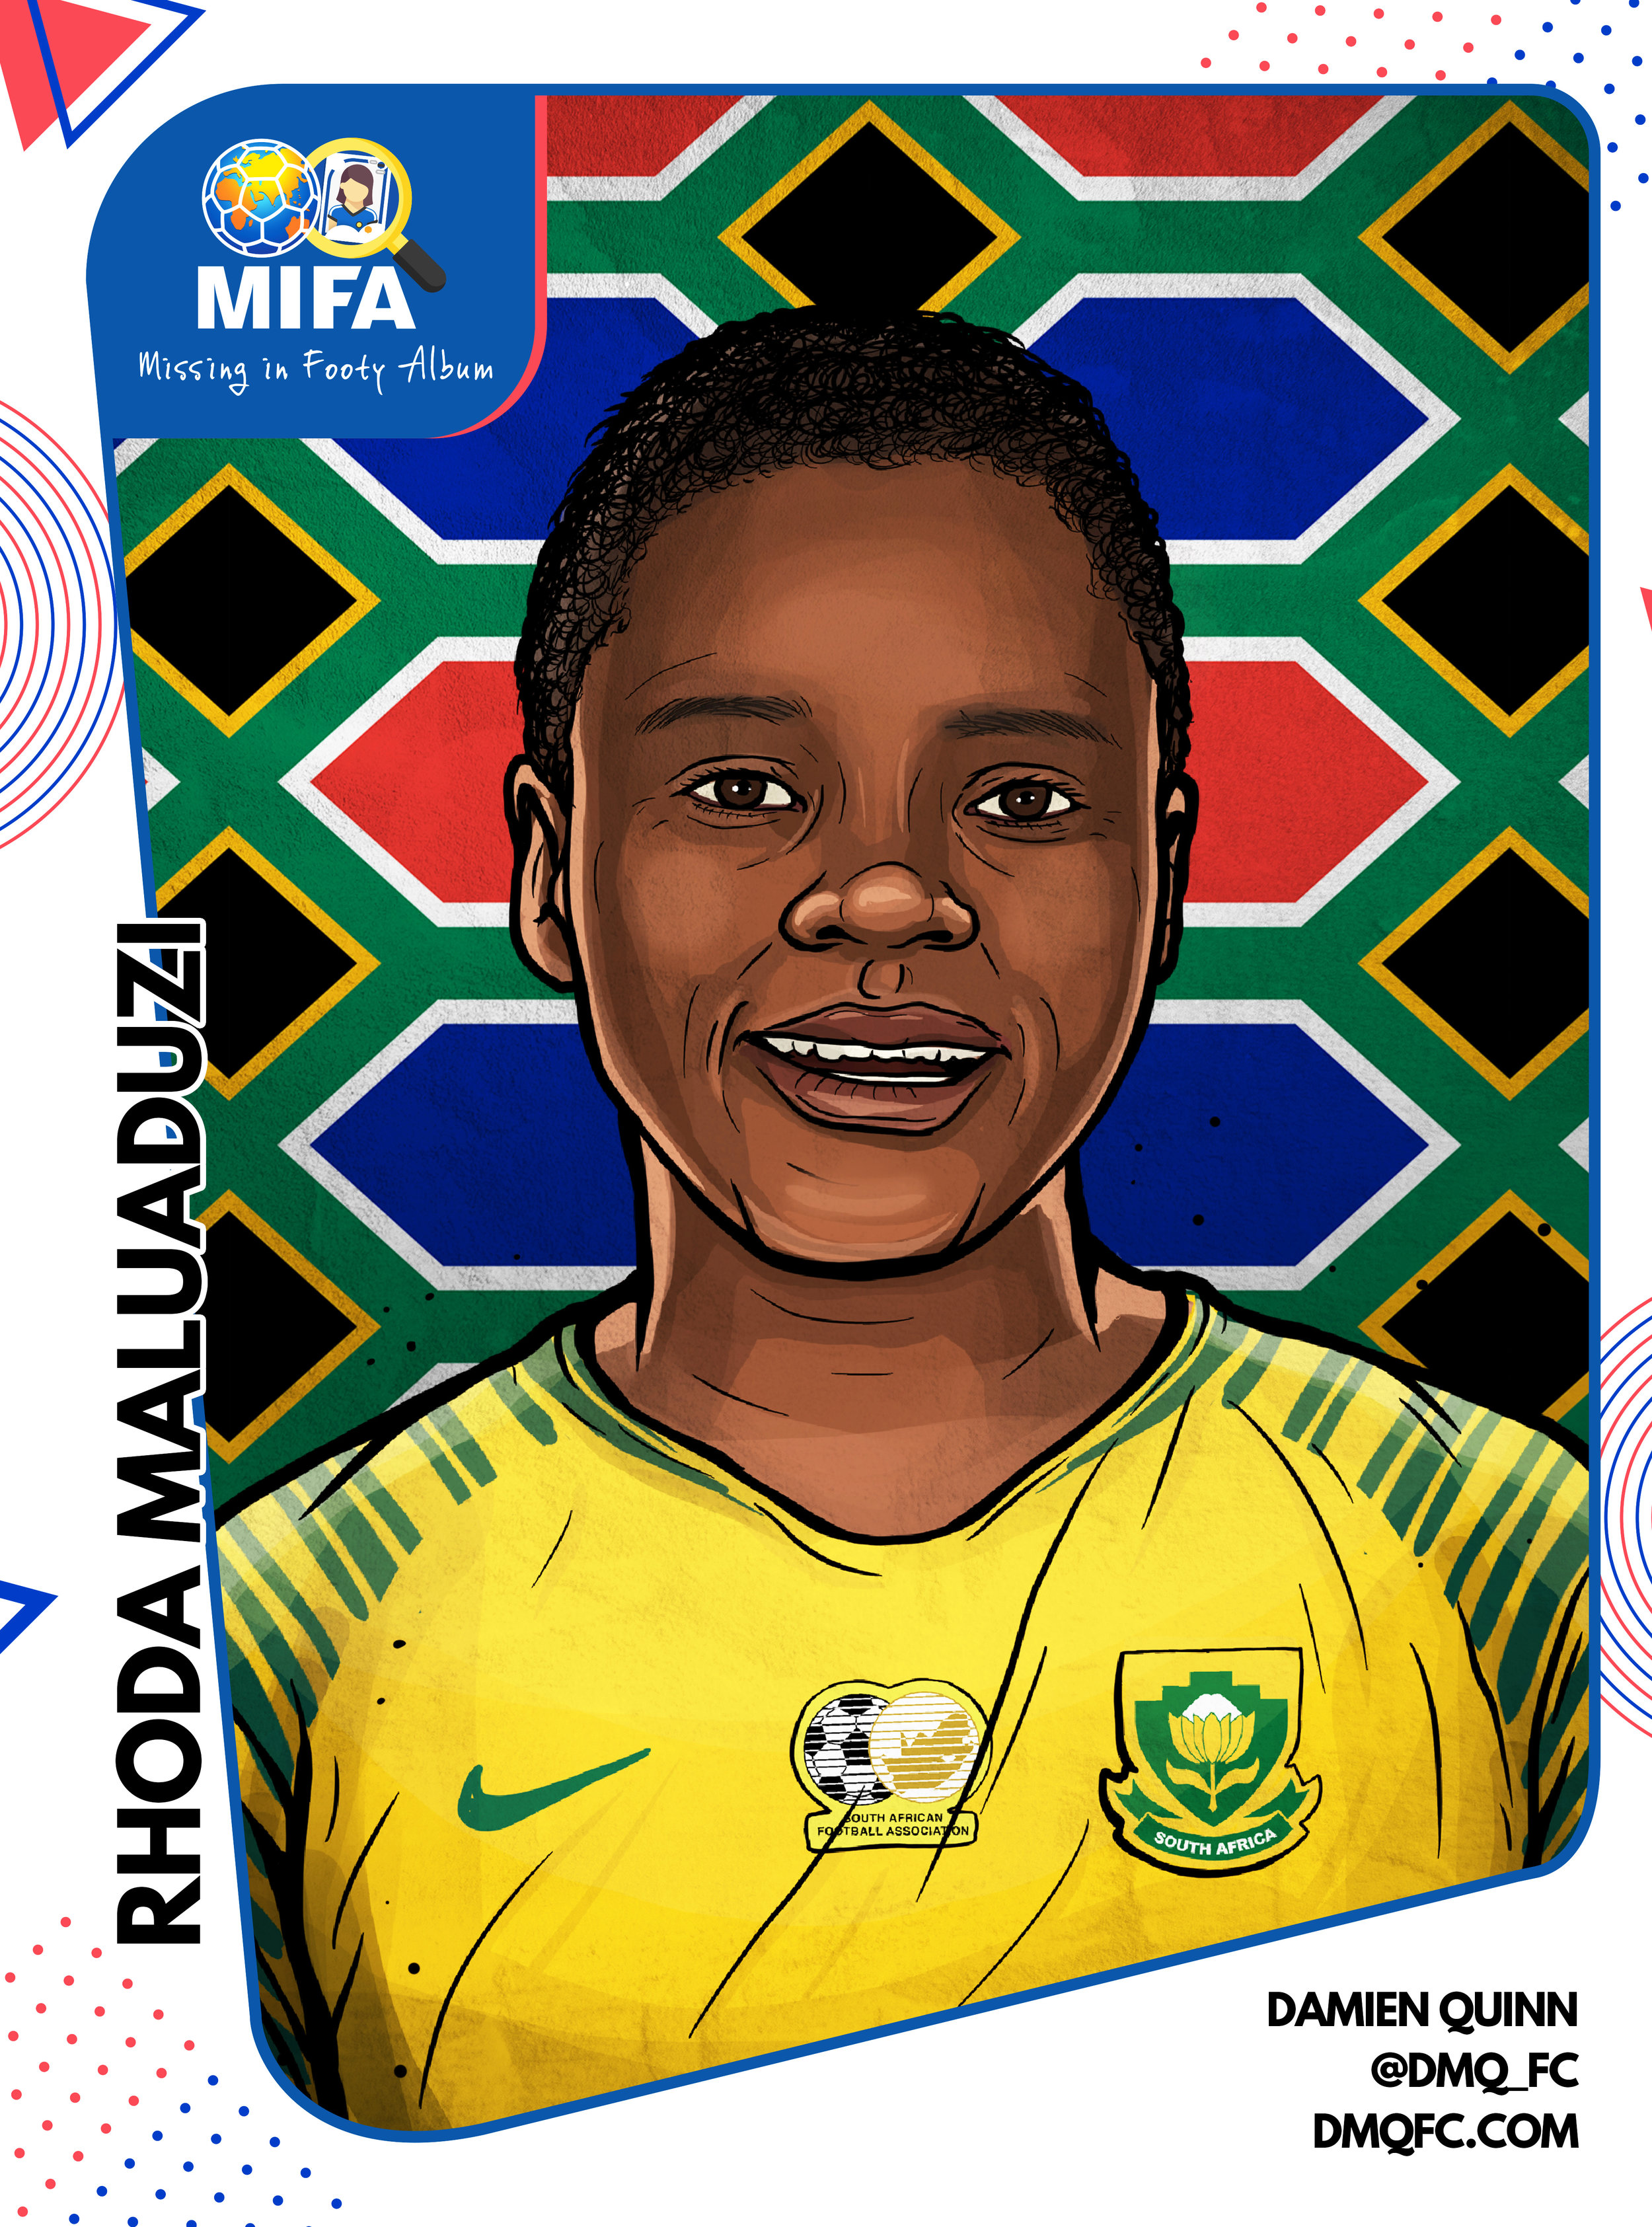 Rhoda_Maluaduzi_South Africa_MIFA 2019_Damien Quinn.JPG